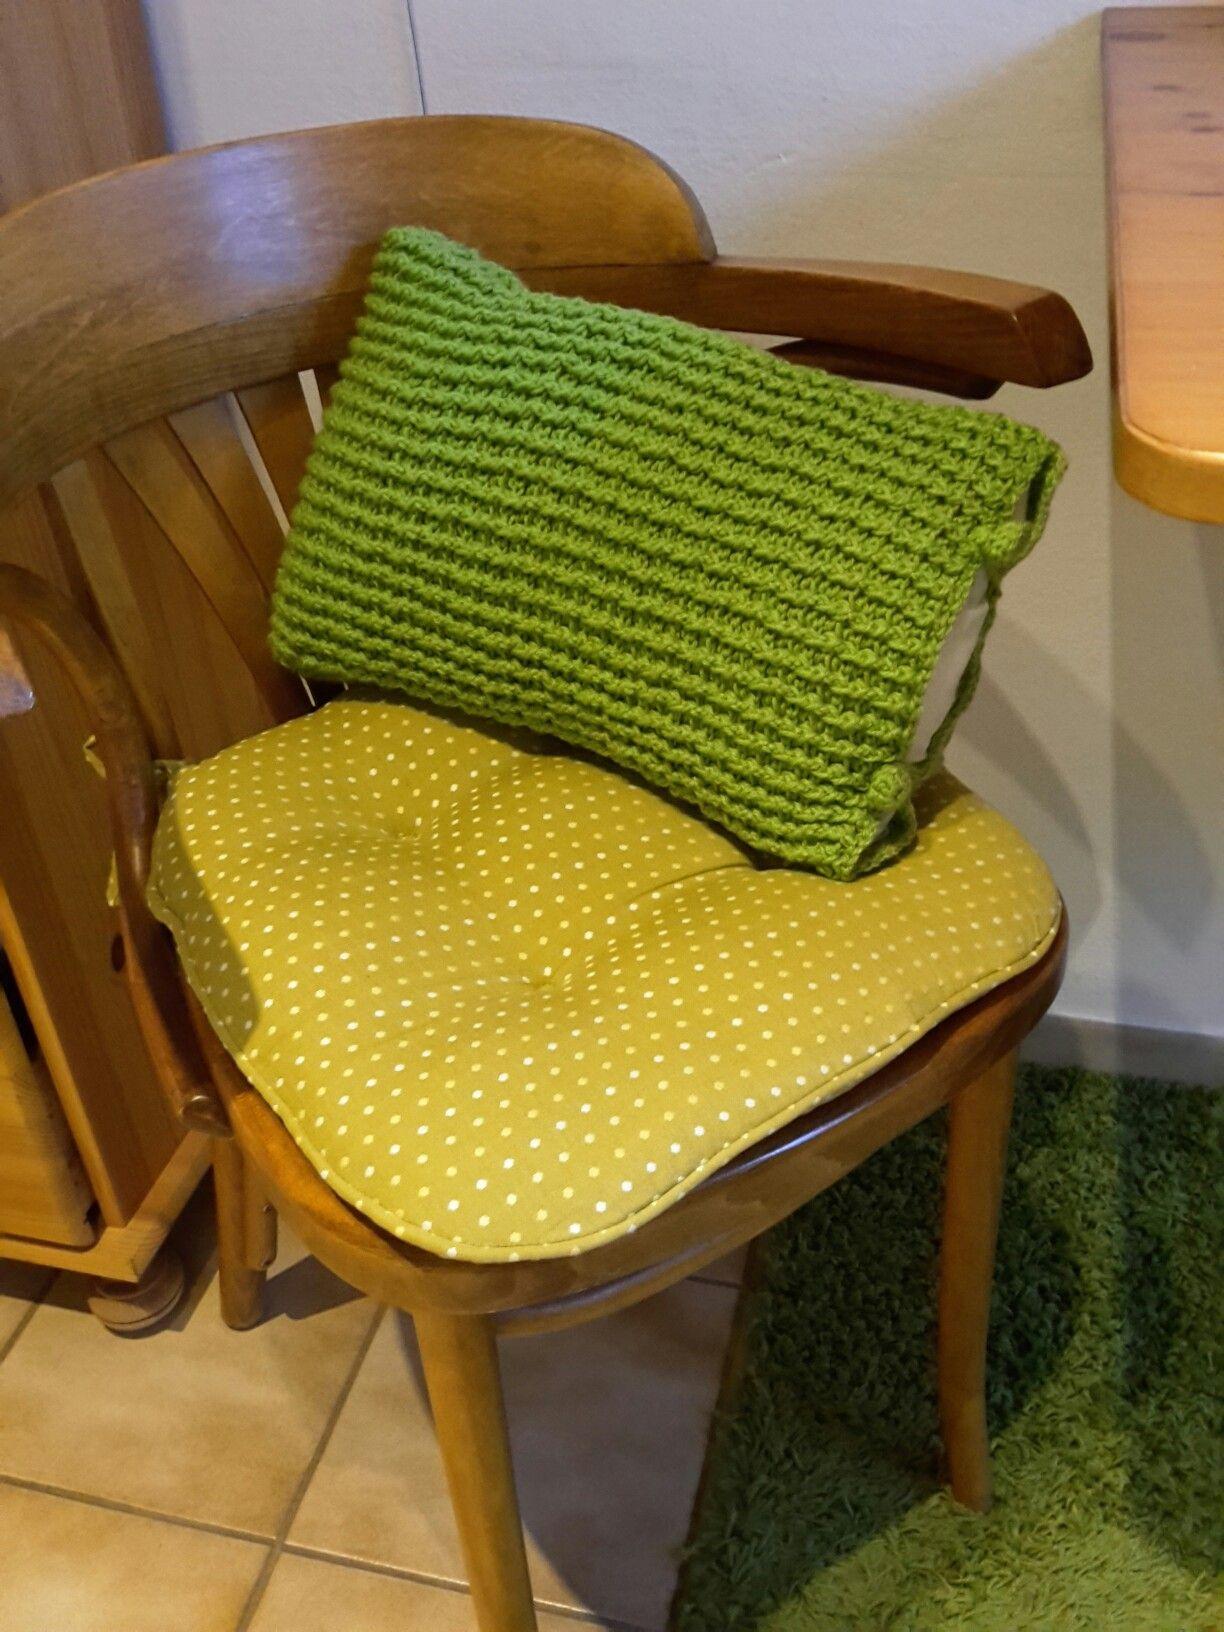 Pin by mayra barta on my crochet projects u more pinterest